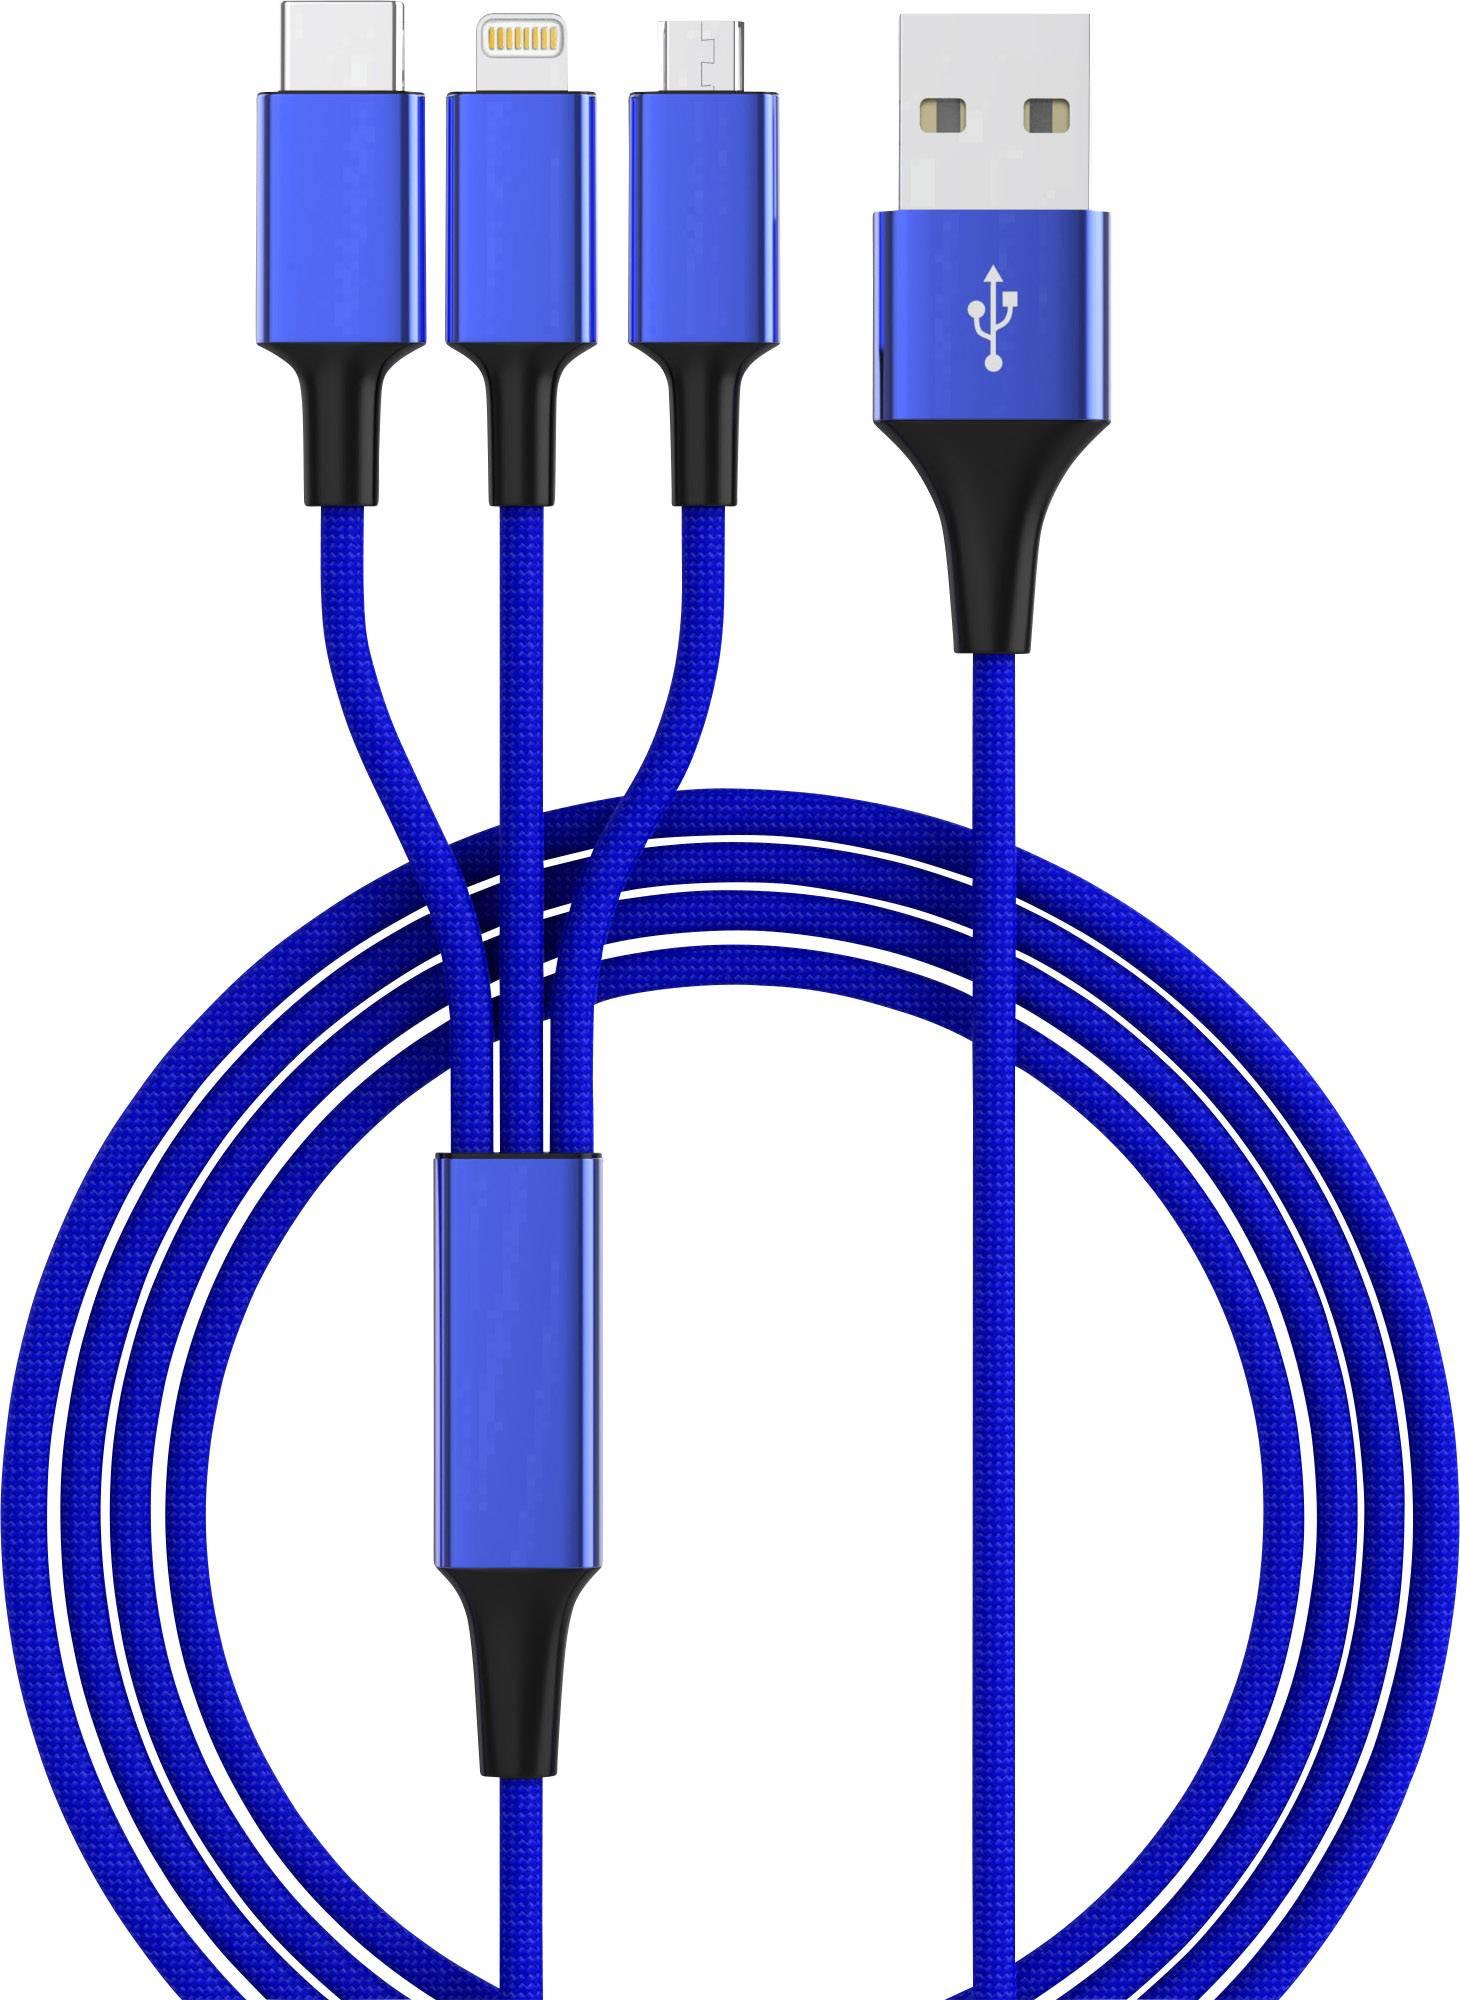 USB 2.0, Apple iPad/iPhone/iPod, USB 3.1 Cavo di collegamento smrter hydra pro 1.2 m Blu